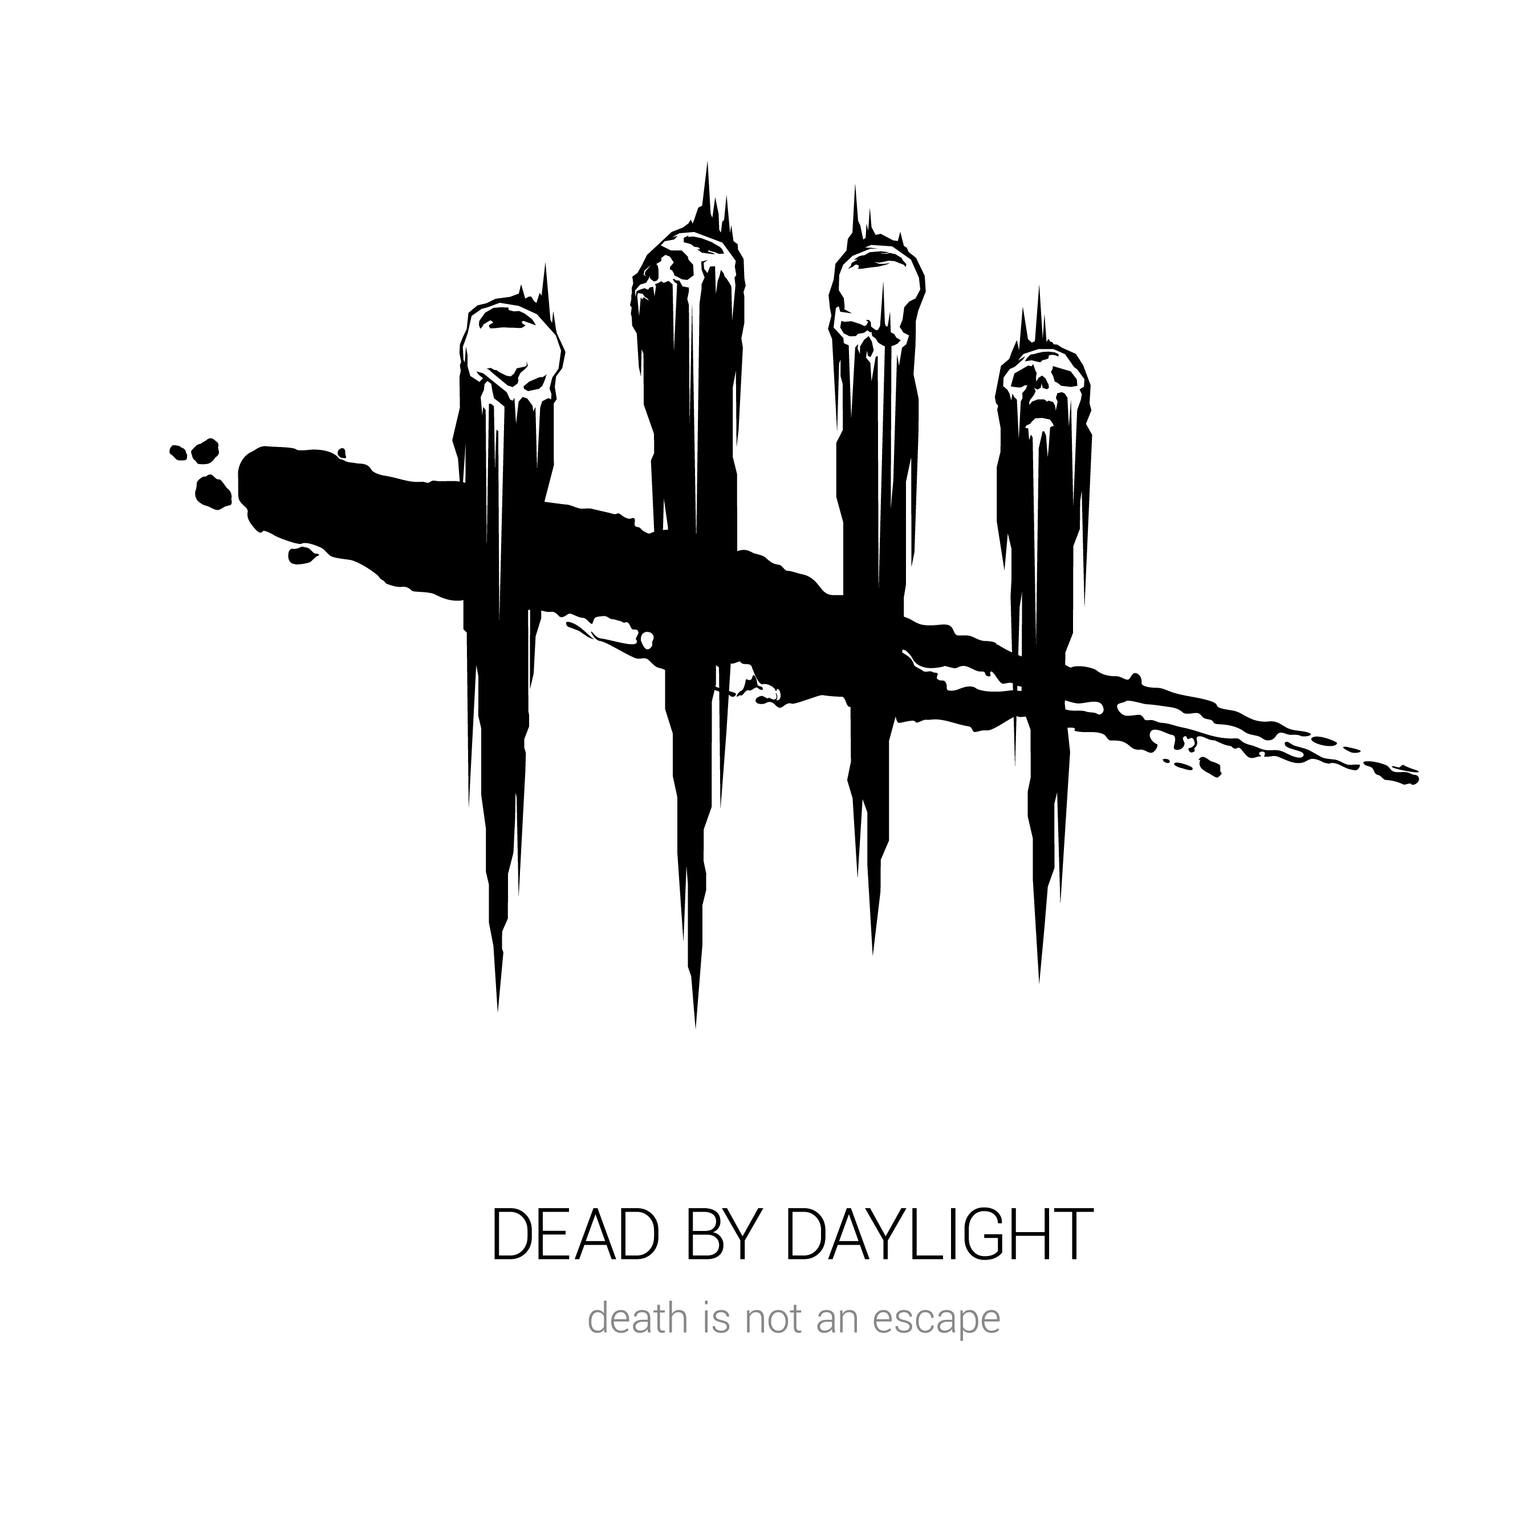 Trailer Dead By Daylight Teases Next Dlc Off The Beaten Track Daylight Gamer Tattoos Dead